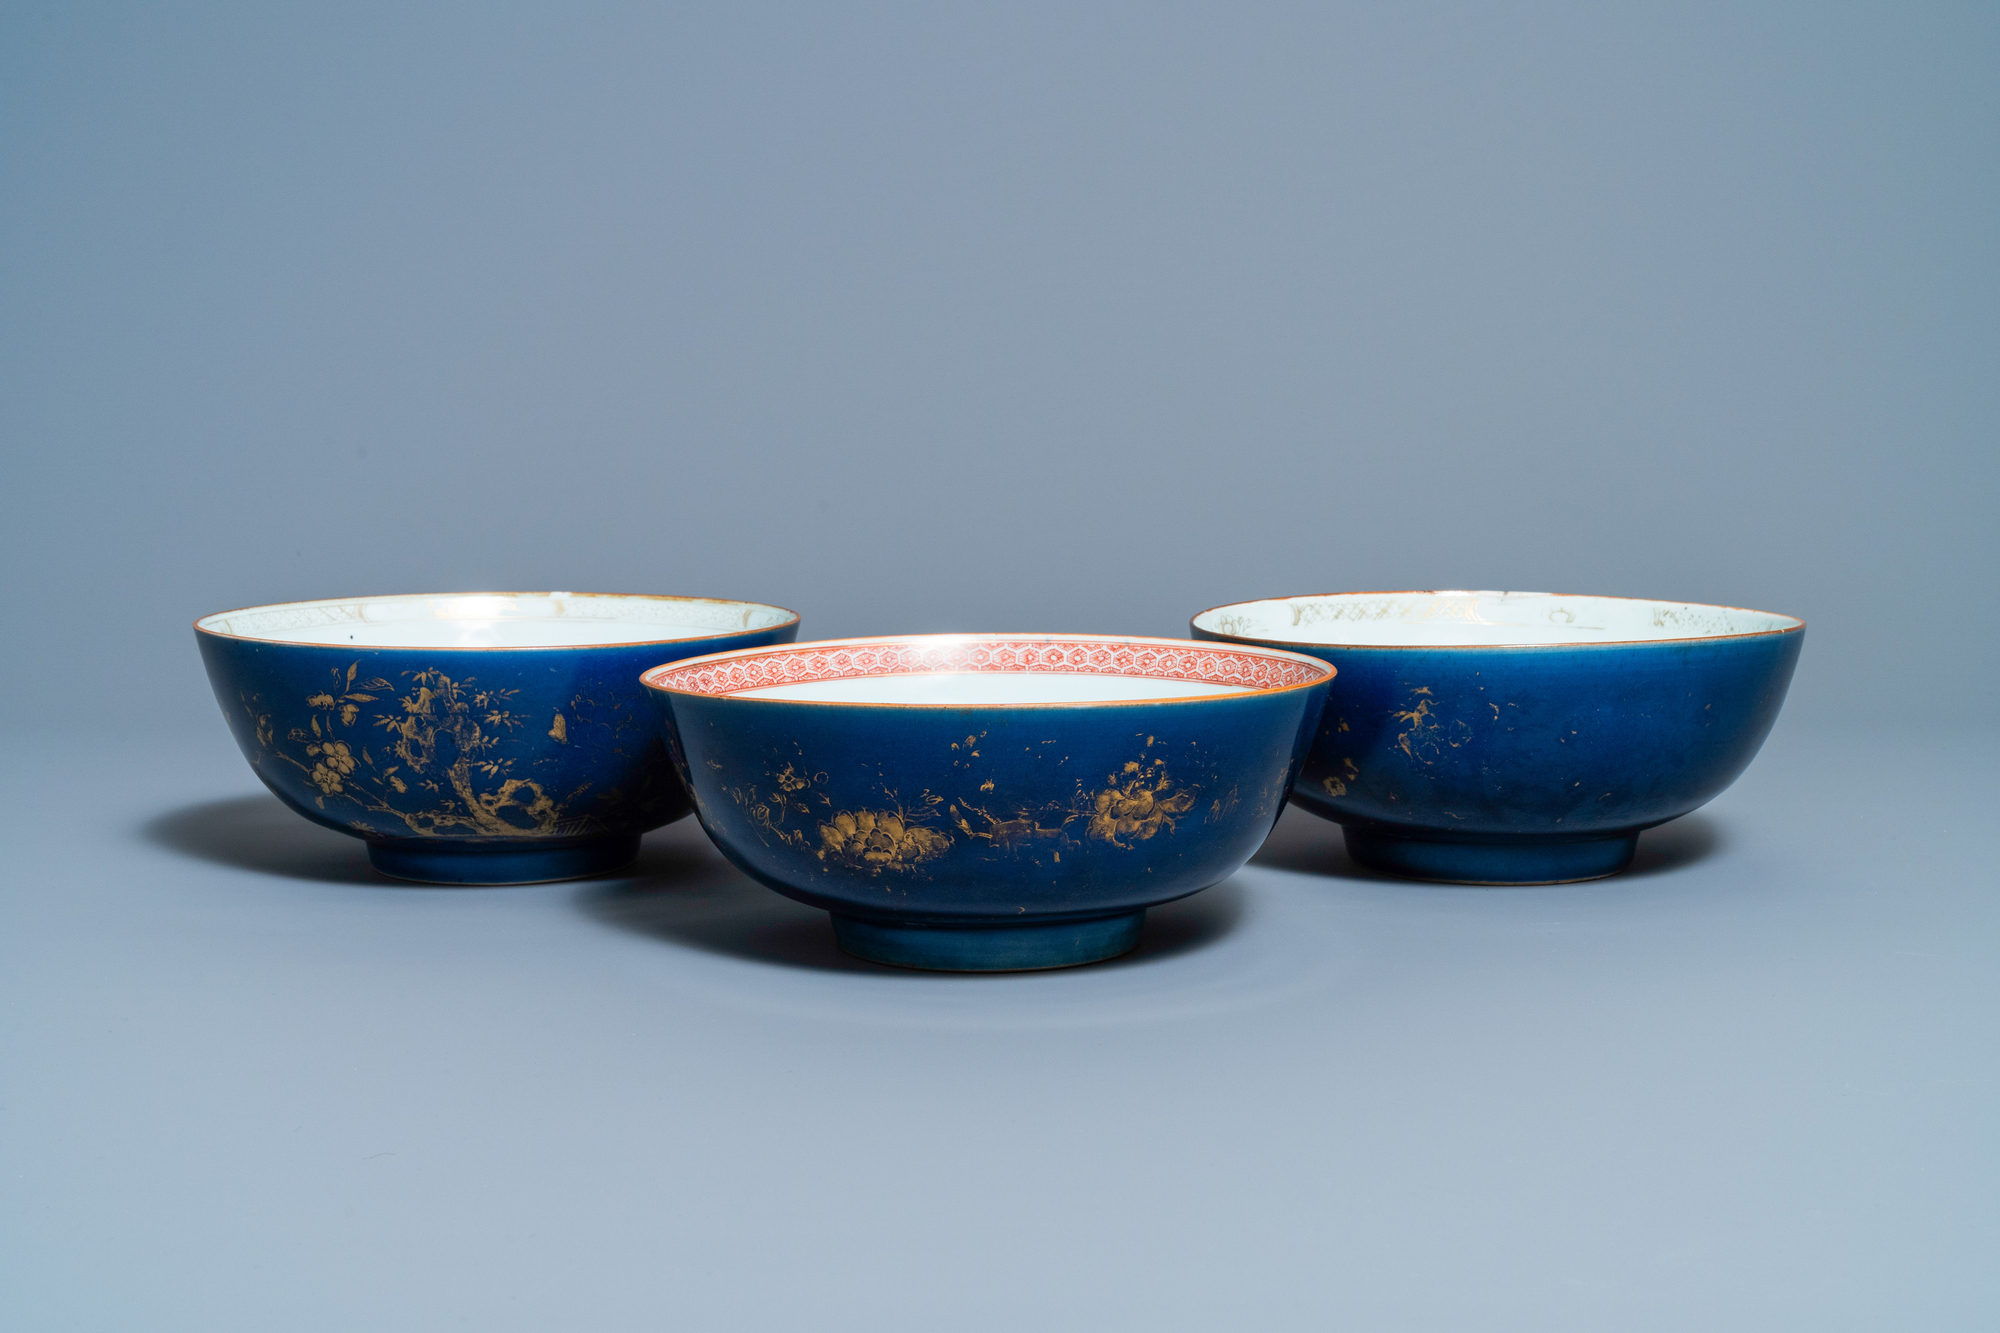 Three Chinese gilt-decorated monochrome blue bowls, Kangxi